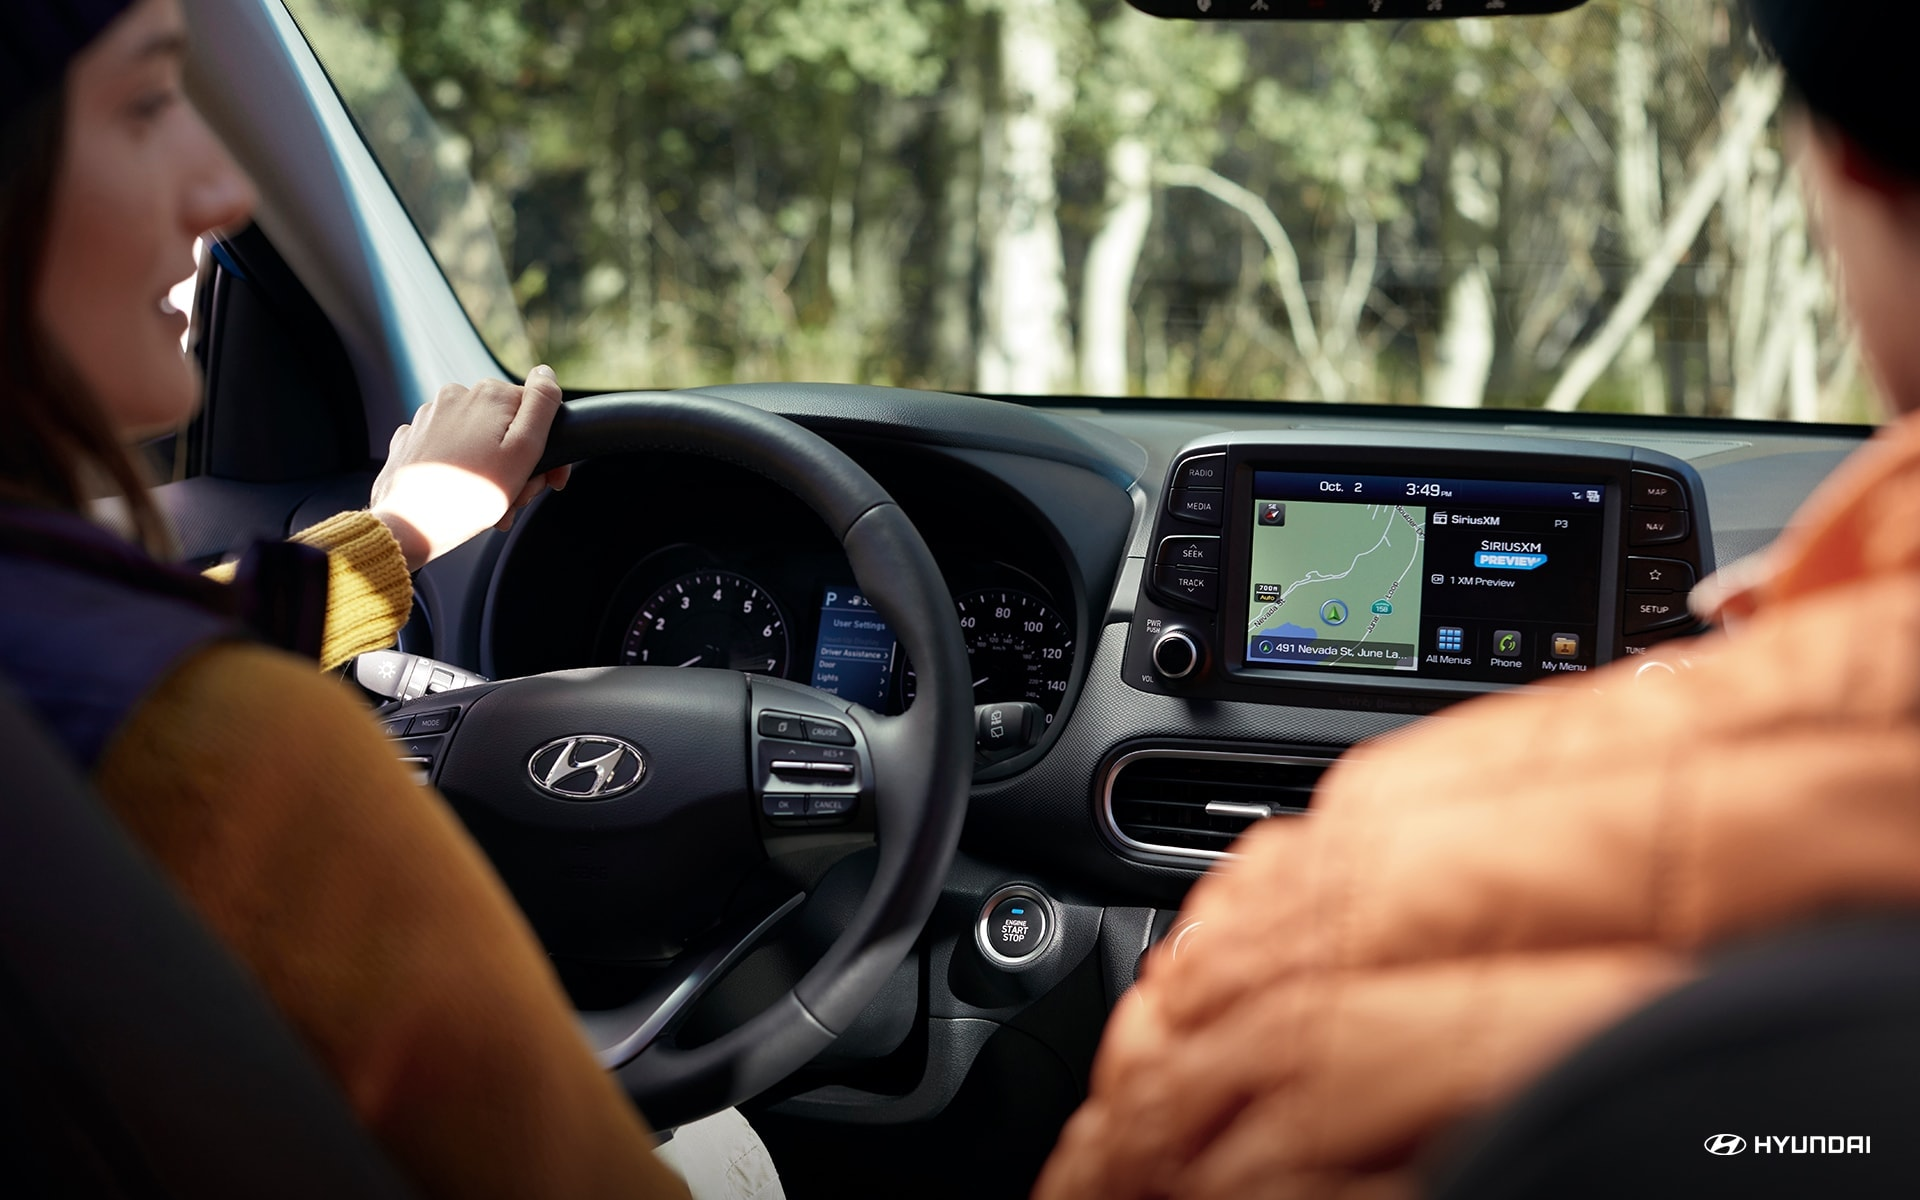 2019 Hyundai Kona Interior Dashboard